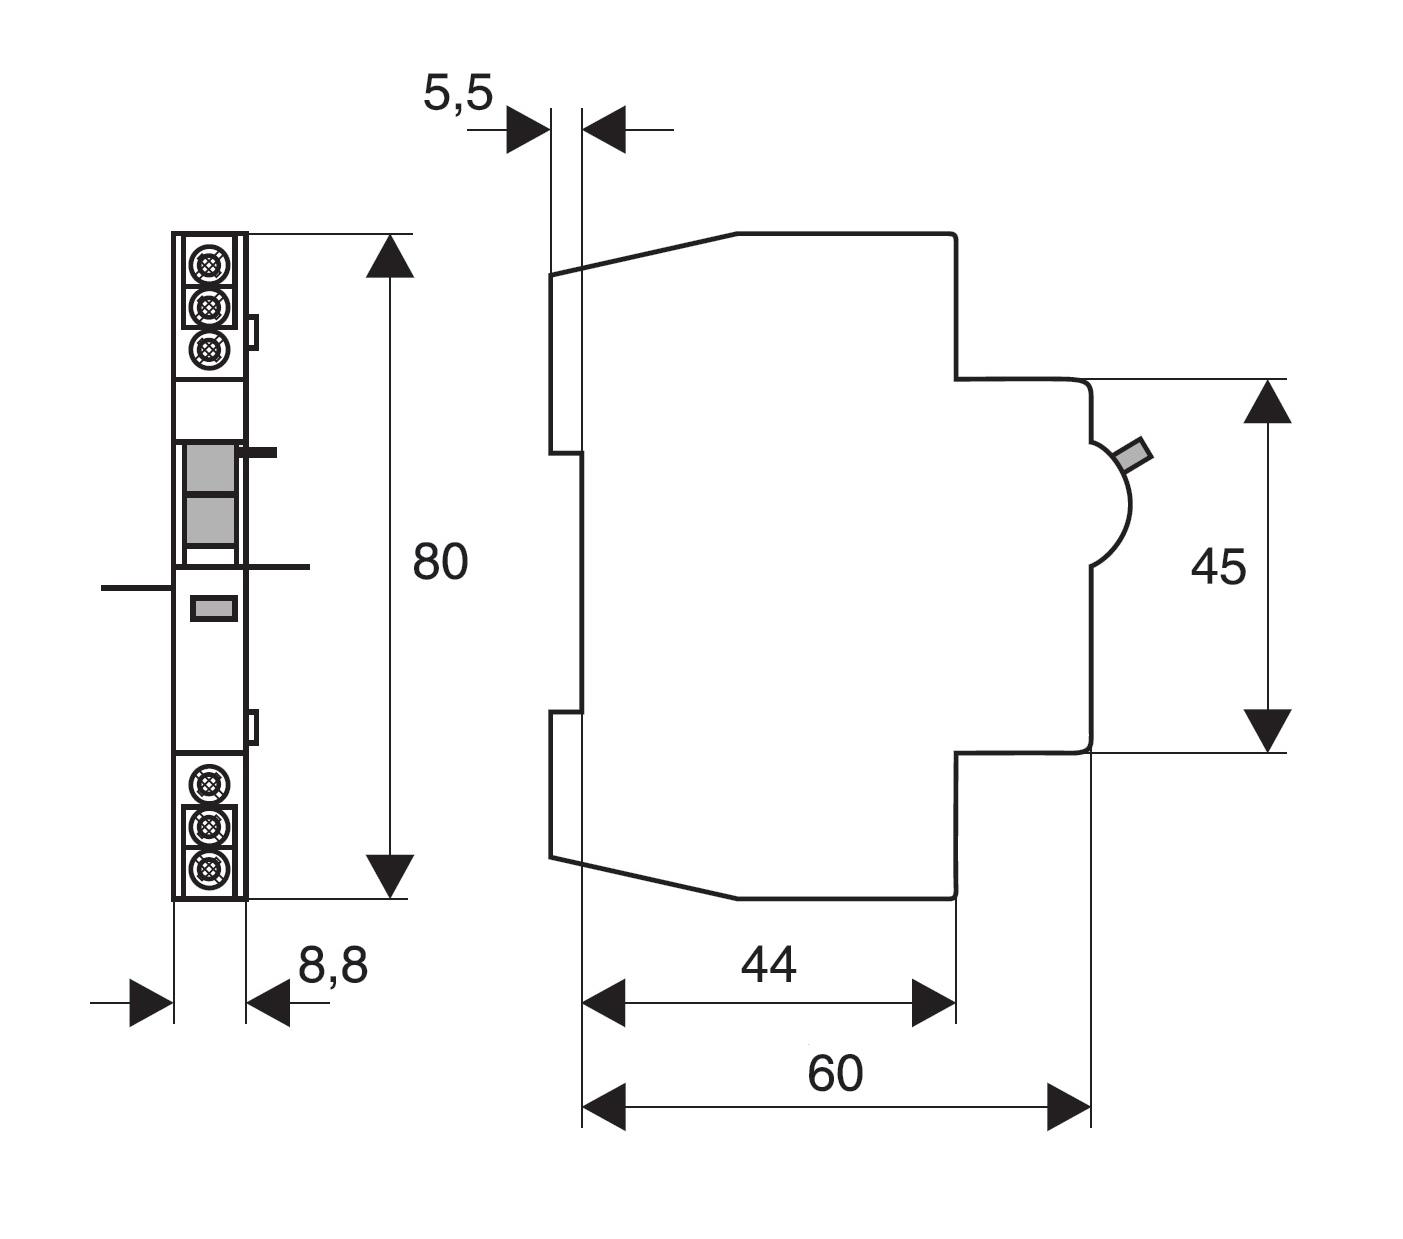 elektro austria ausl se signalkontakt 2 wechsler. Black Bedroom Furniture Sets. Home Design Ideas